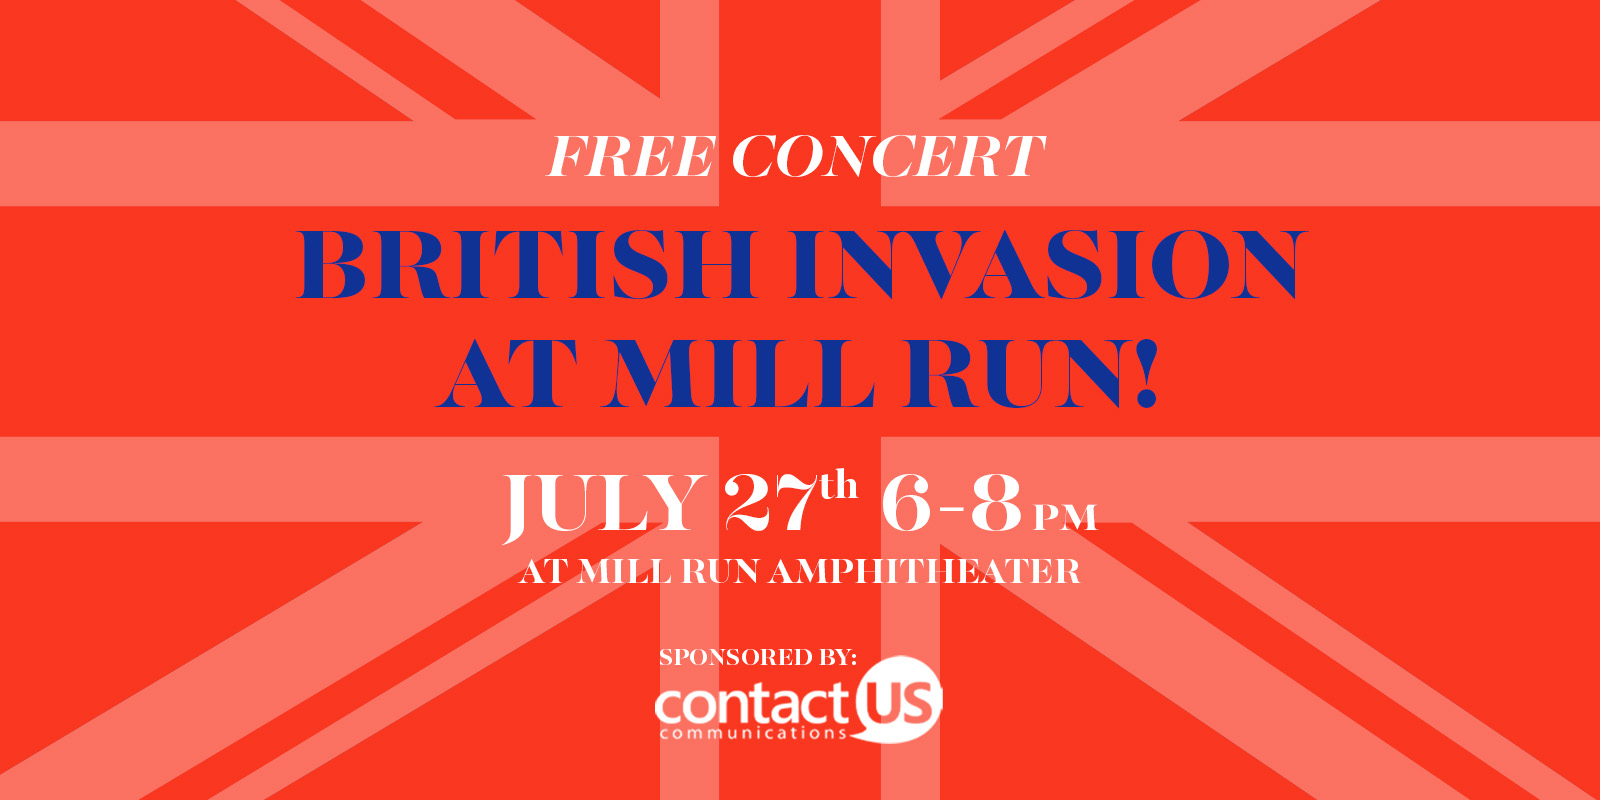 Free Concert at Mill Run